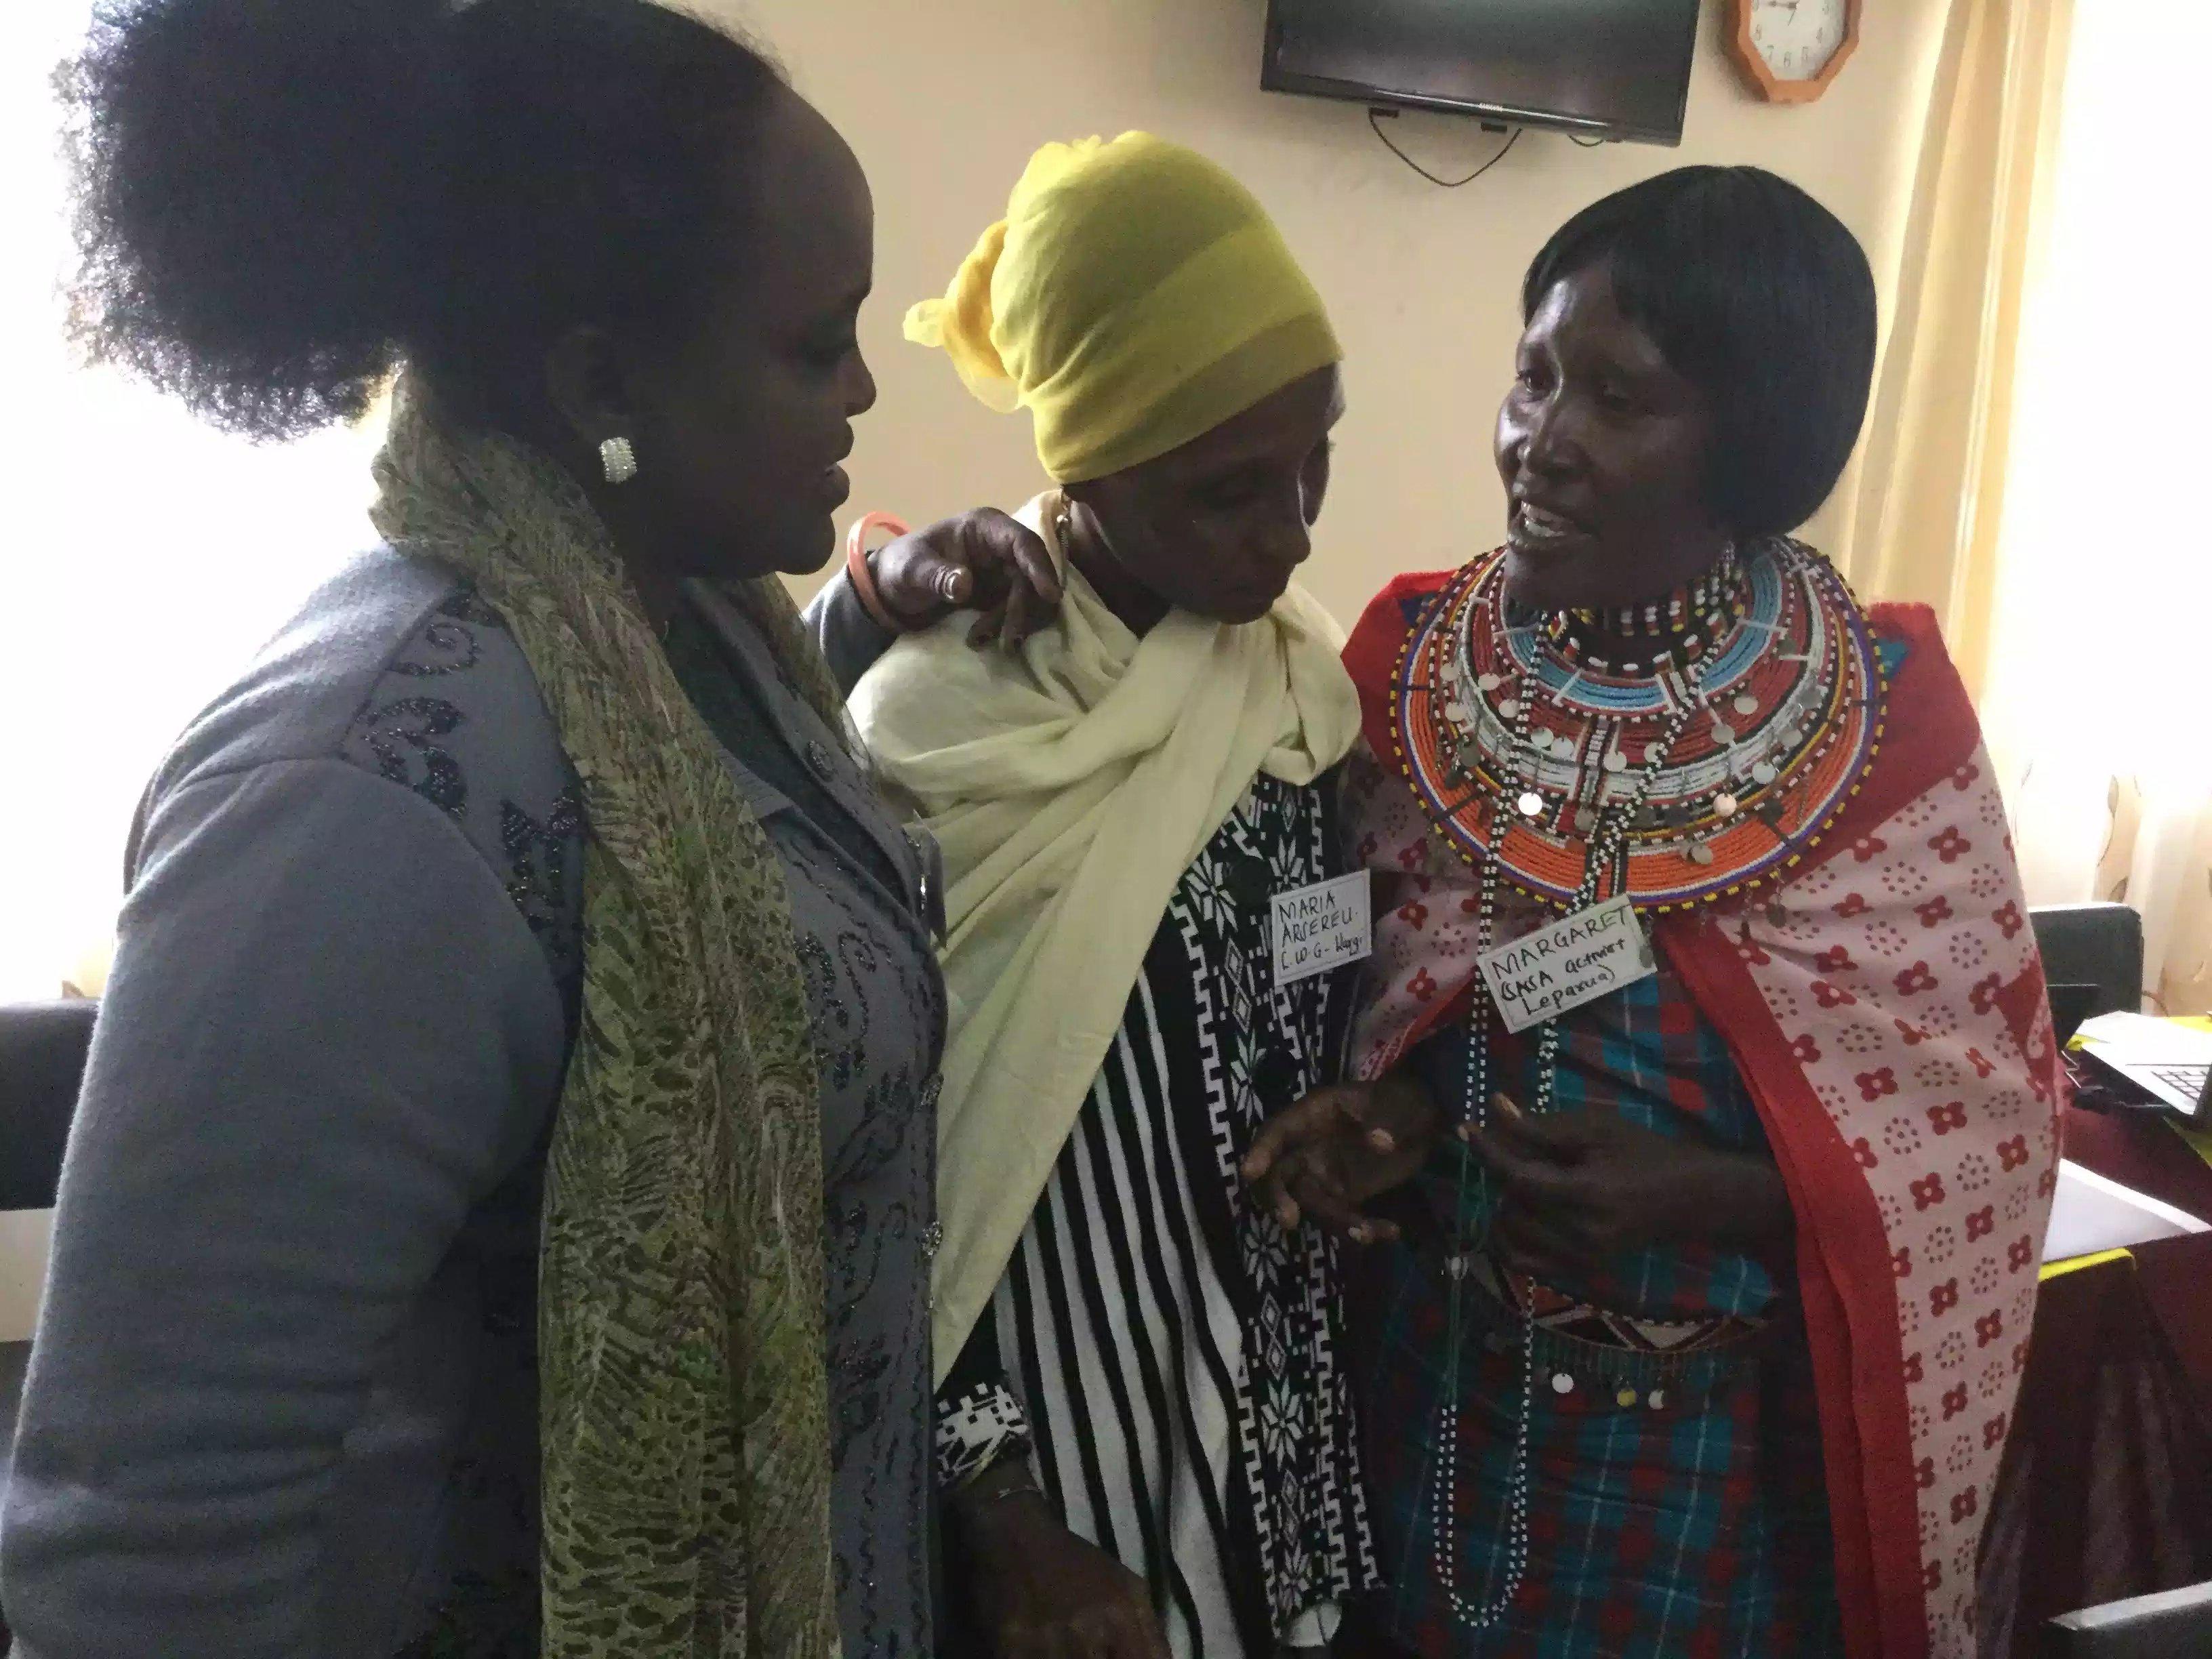 http://indigenouswomen-africa.org/wp-content/uploads/2018/03/image-31660.jpeg